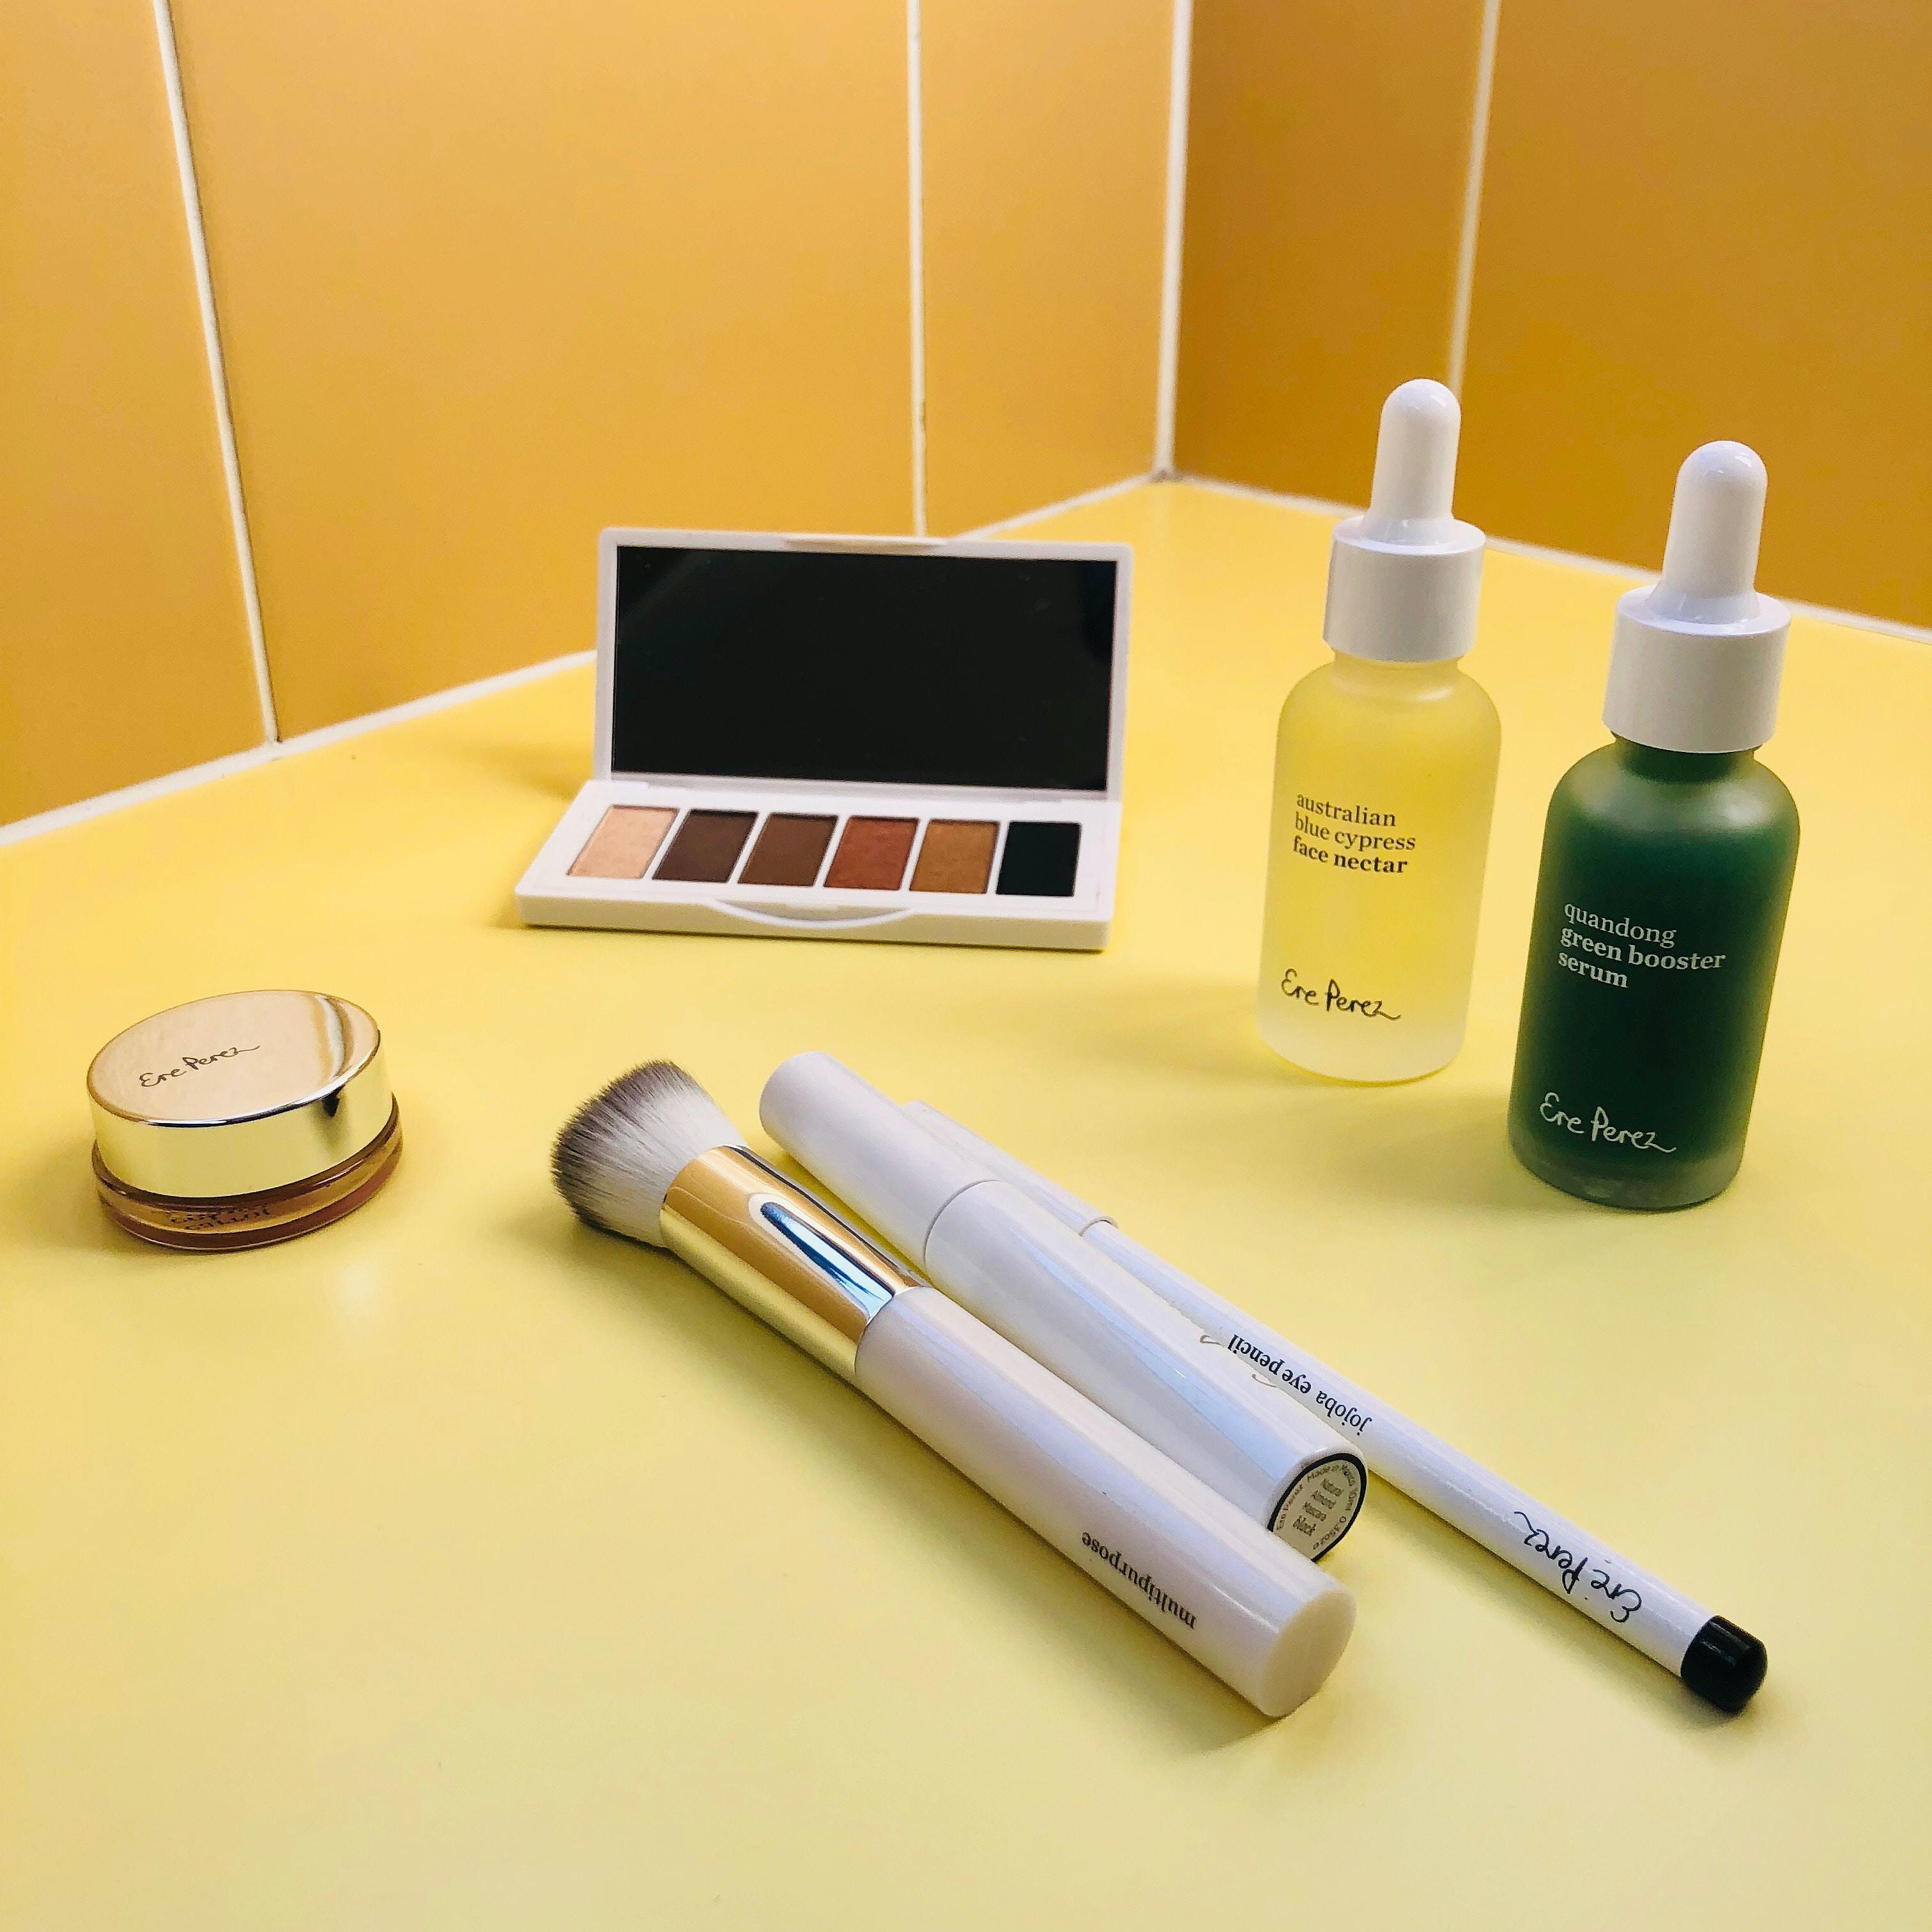 several cosmetics